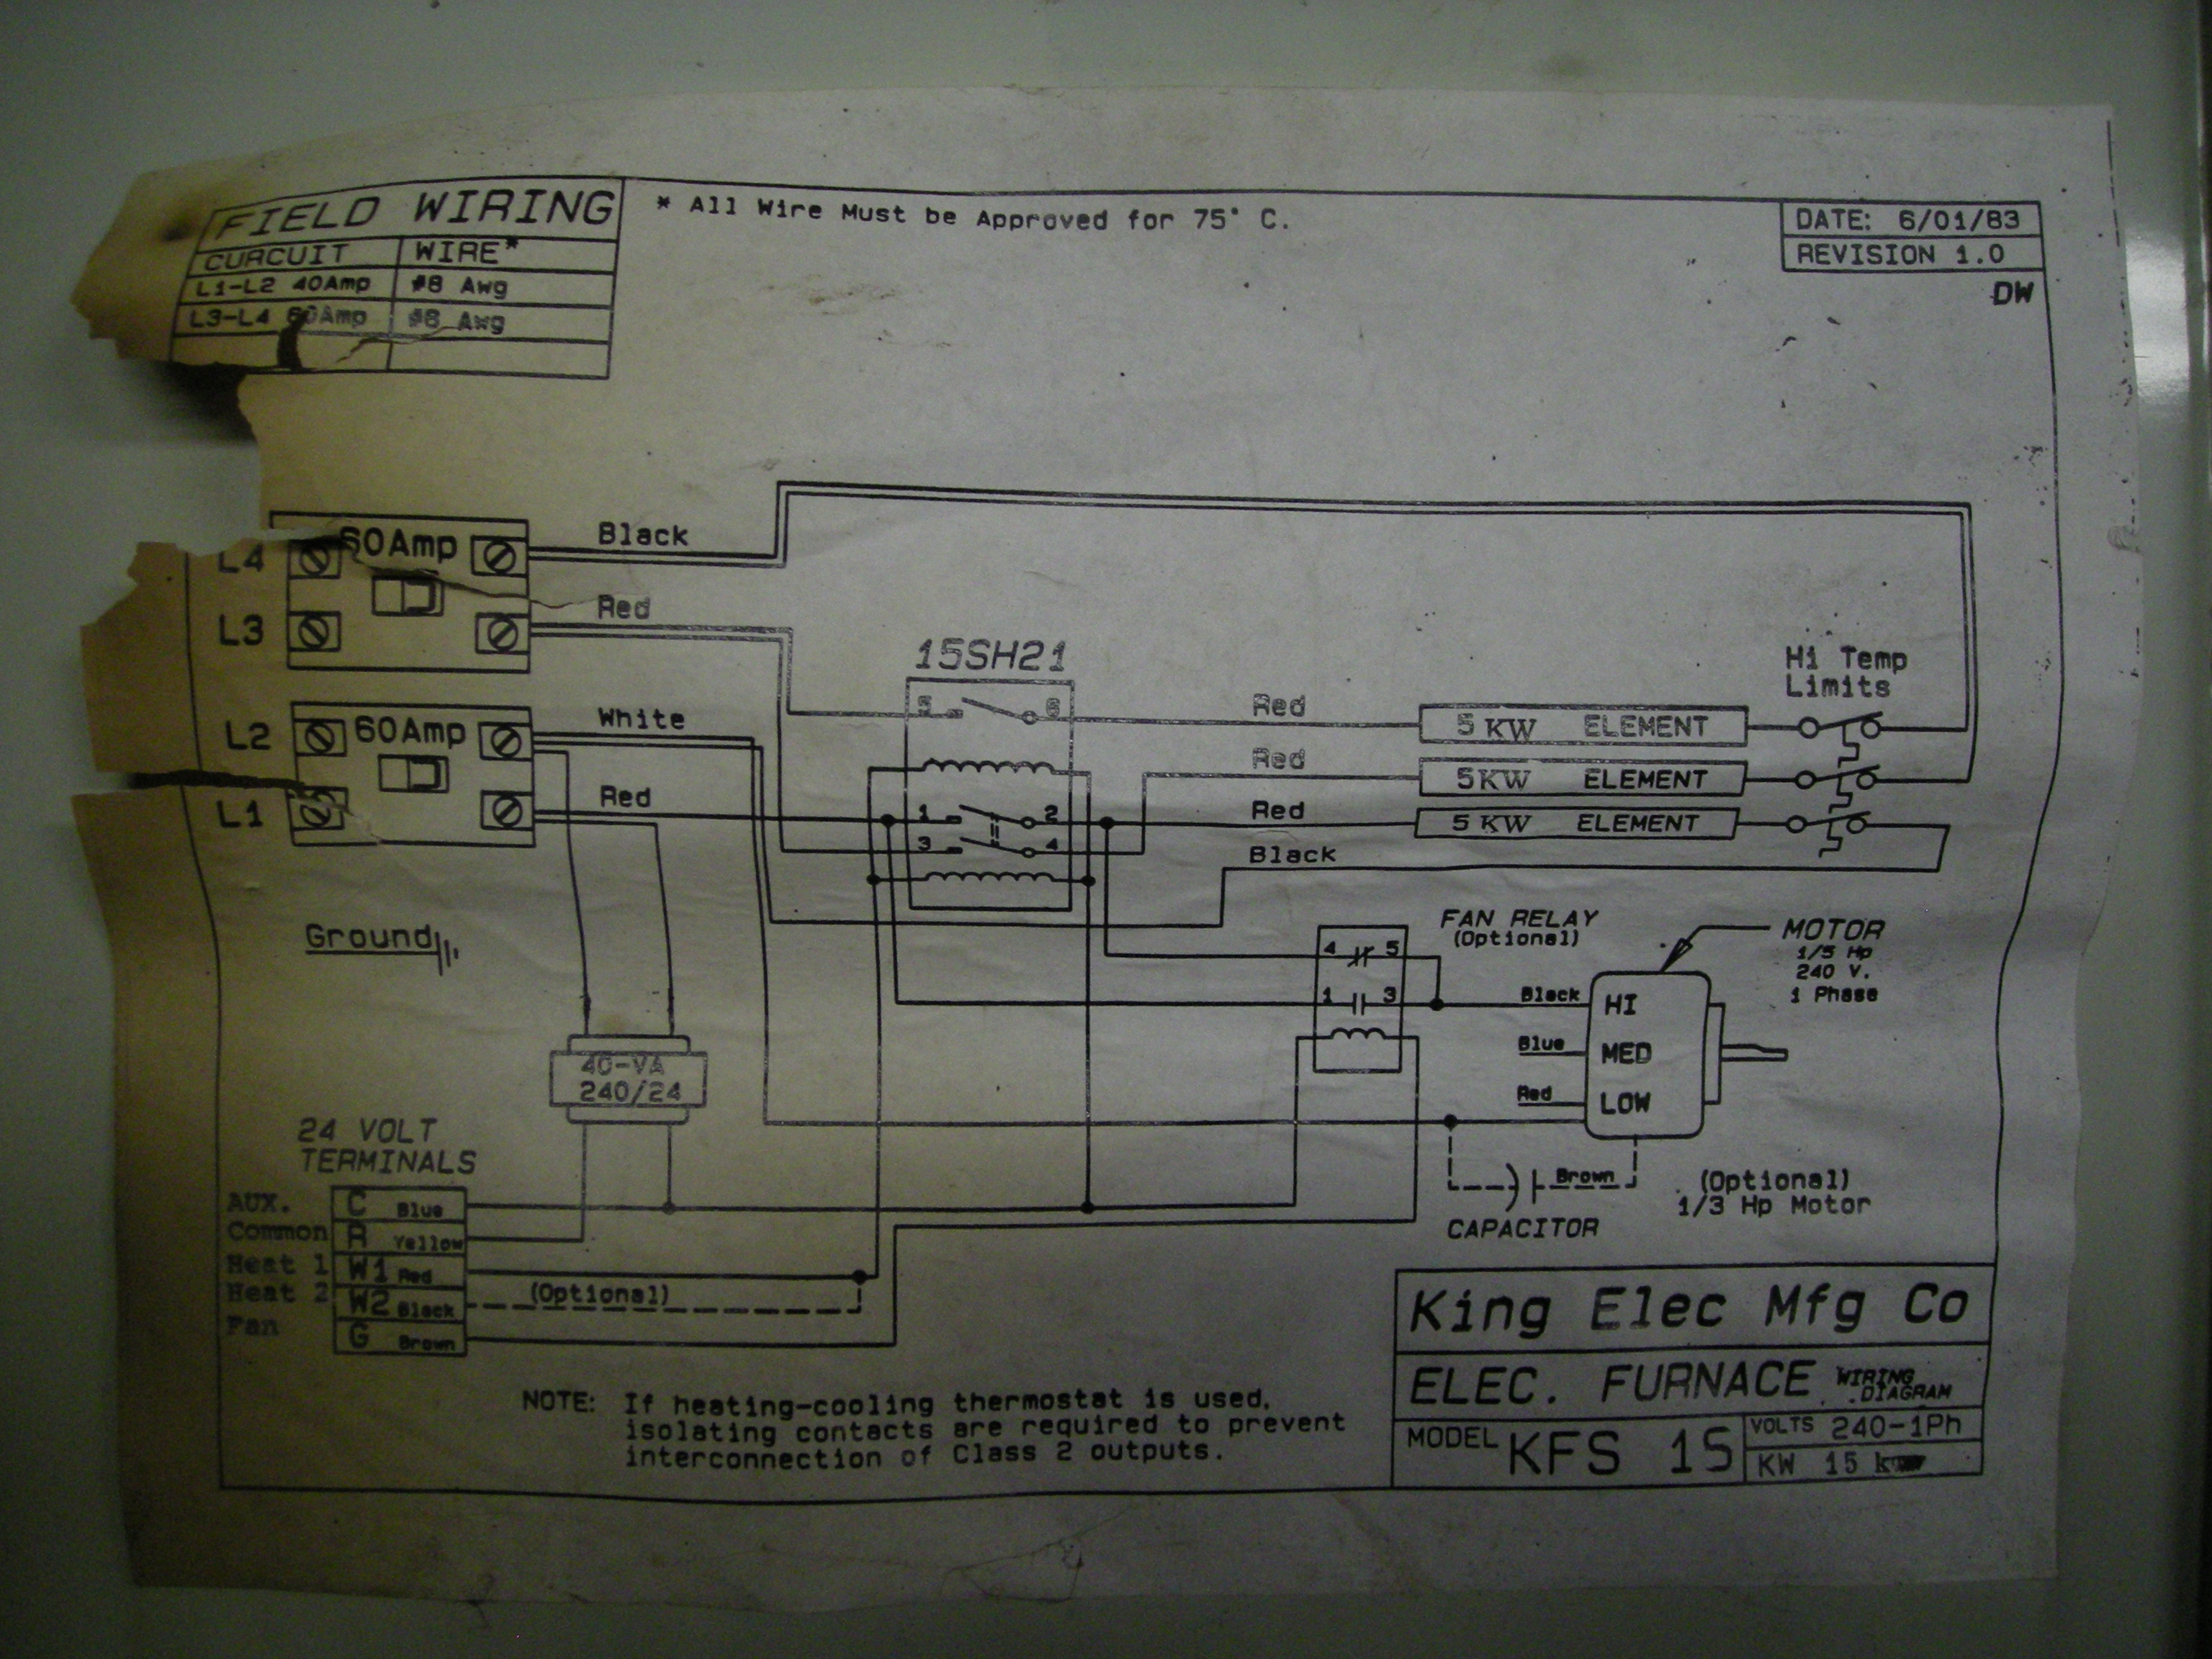 Remarkable Ac Air Handler Fan Relay Wiring Diagram Wiring Library Wiring Cloud Waroletkolfr09Org